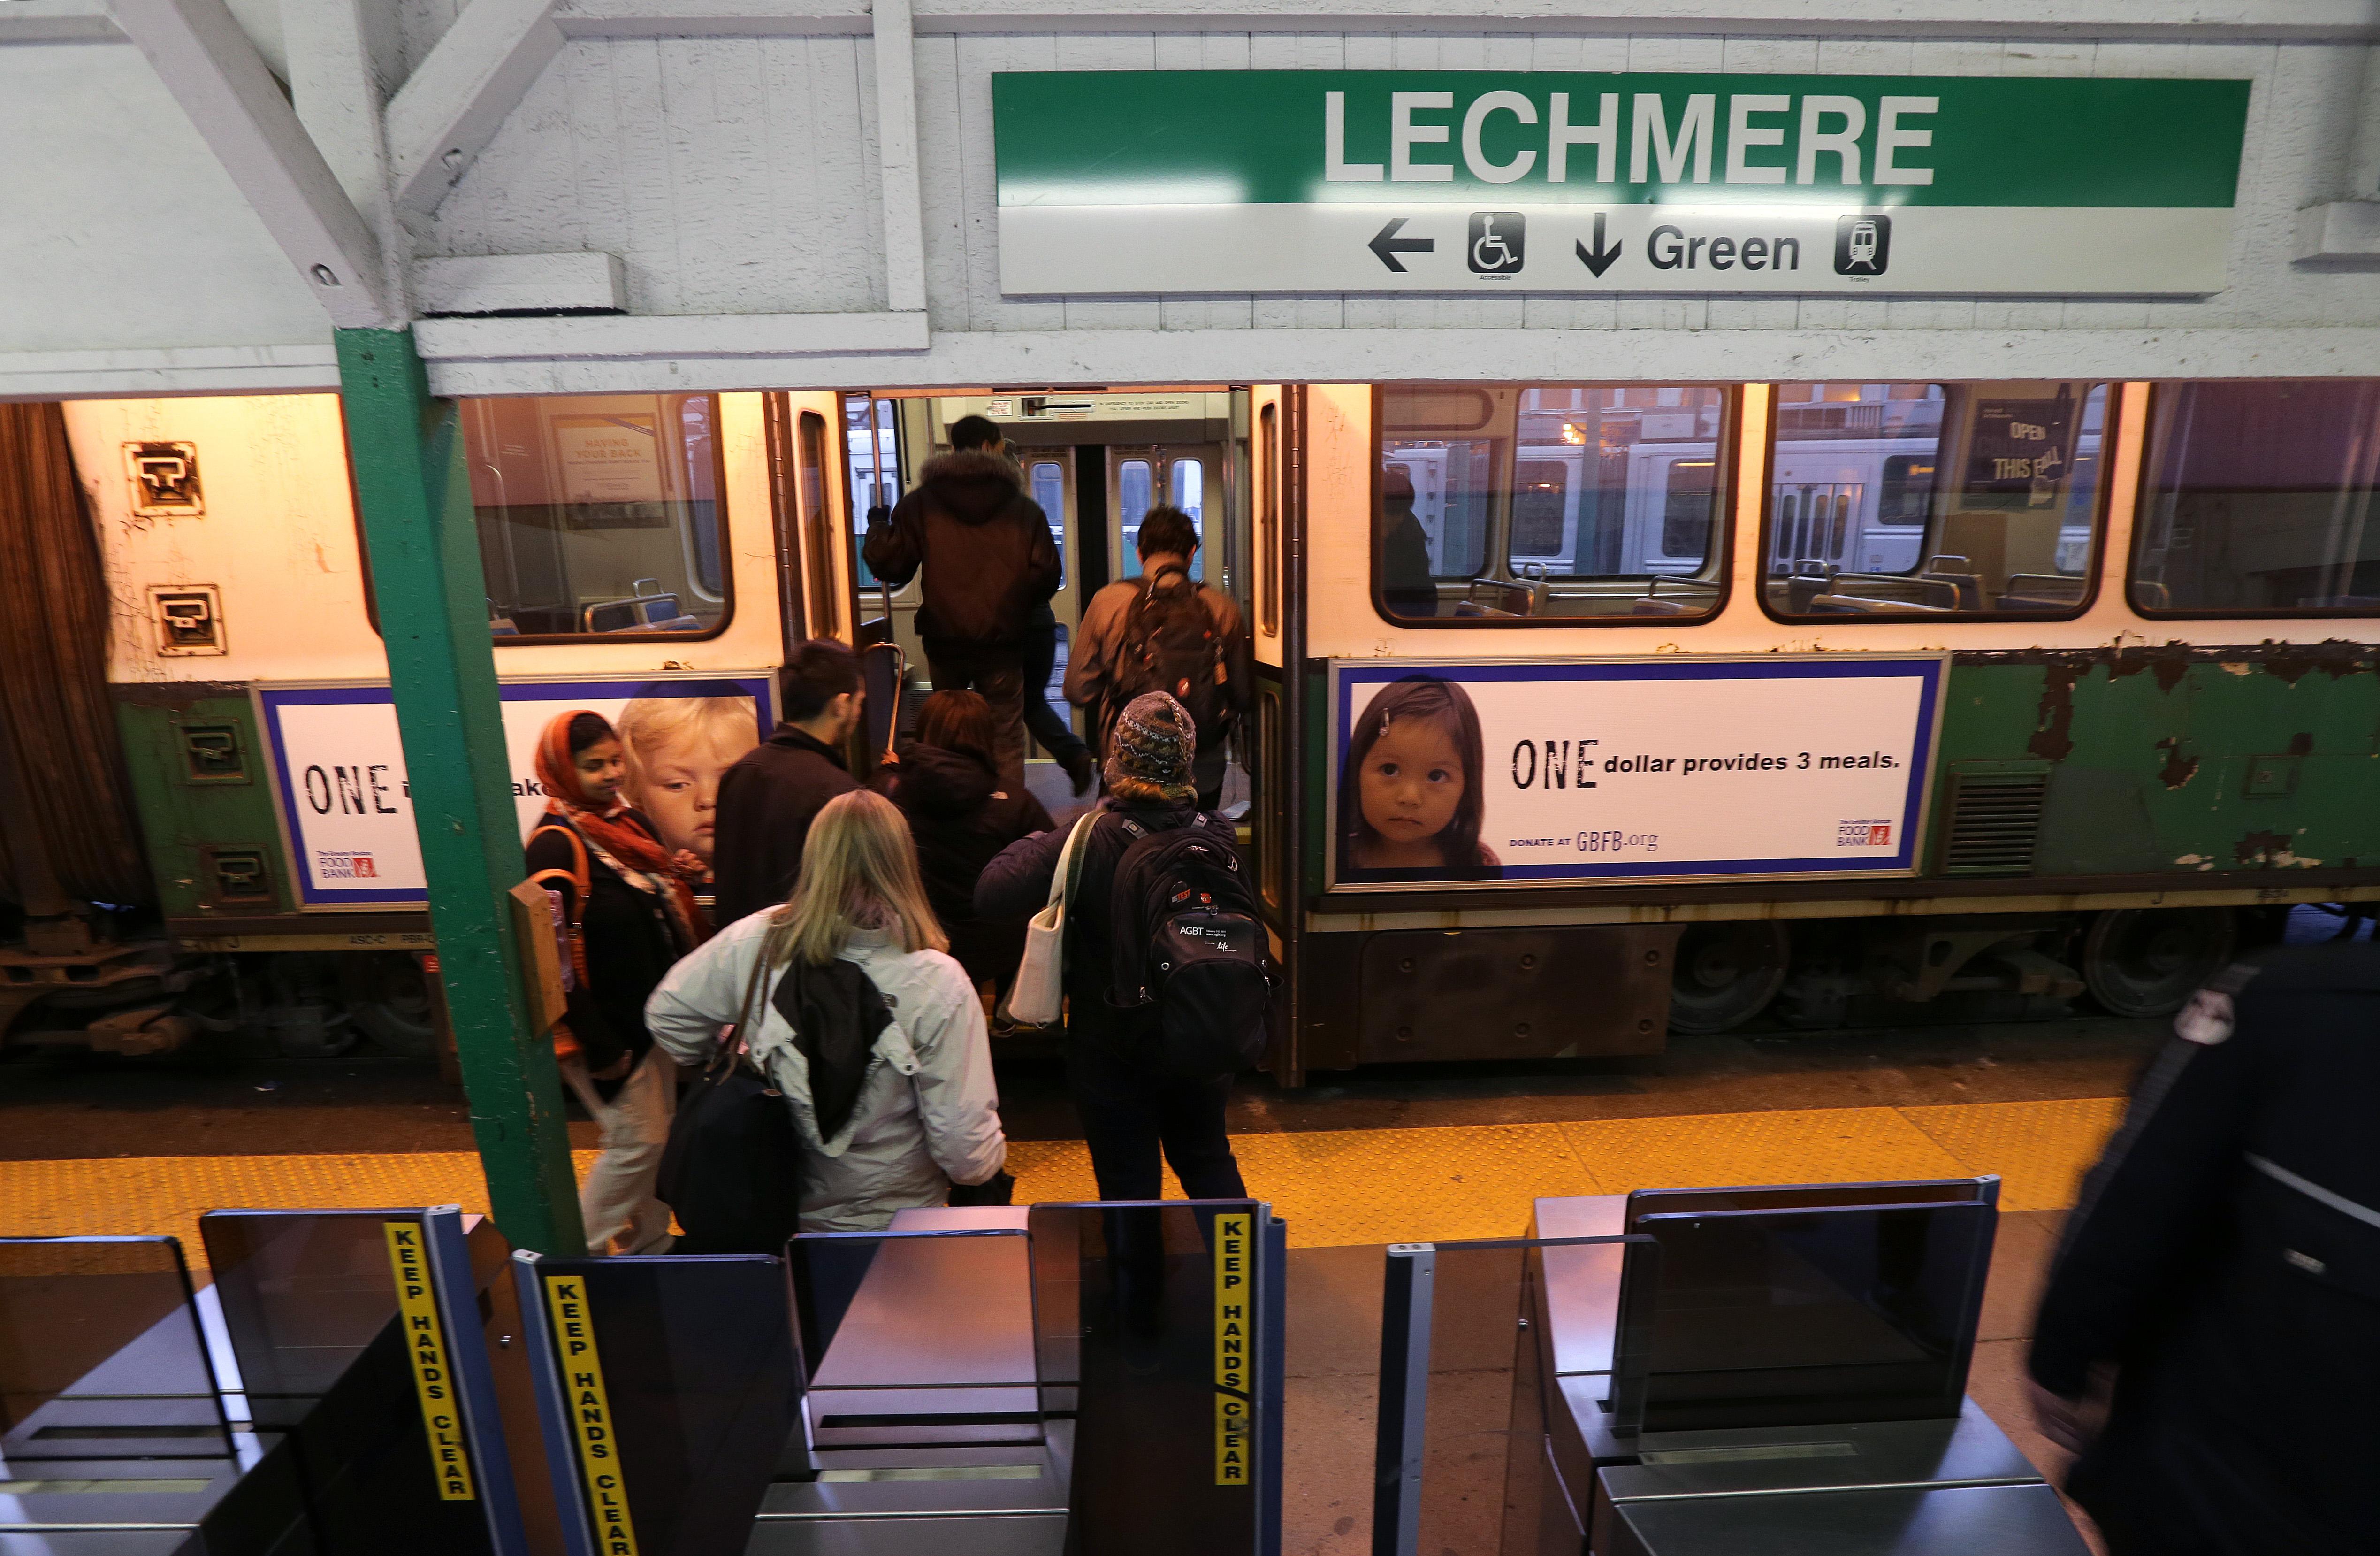 People boarding a subway trolley.